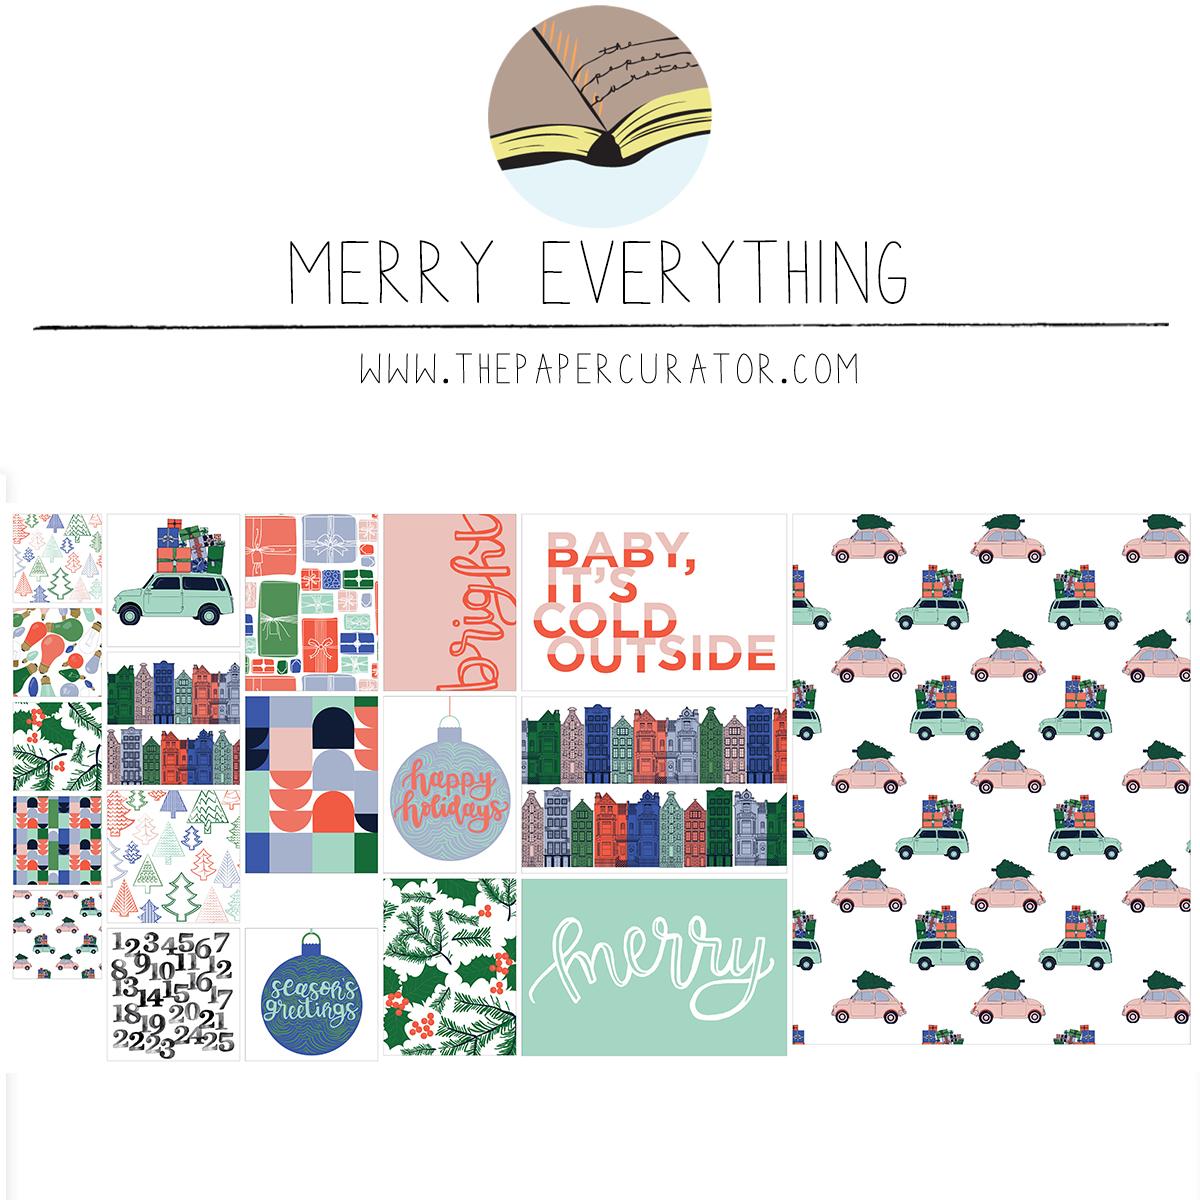 MerryEverything_KIT_OVERVIEW1.jpg